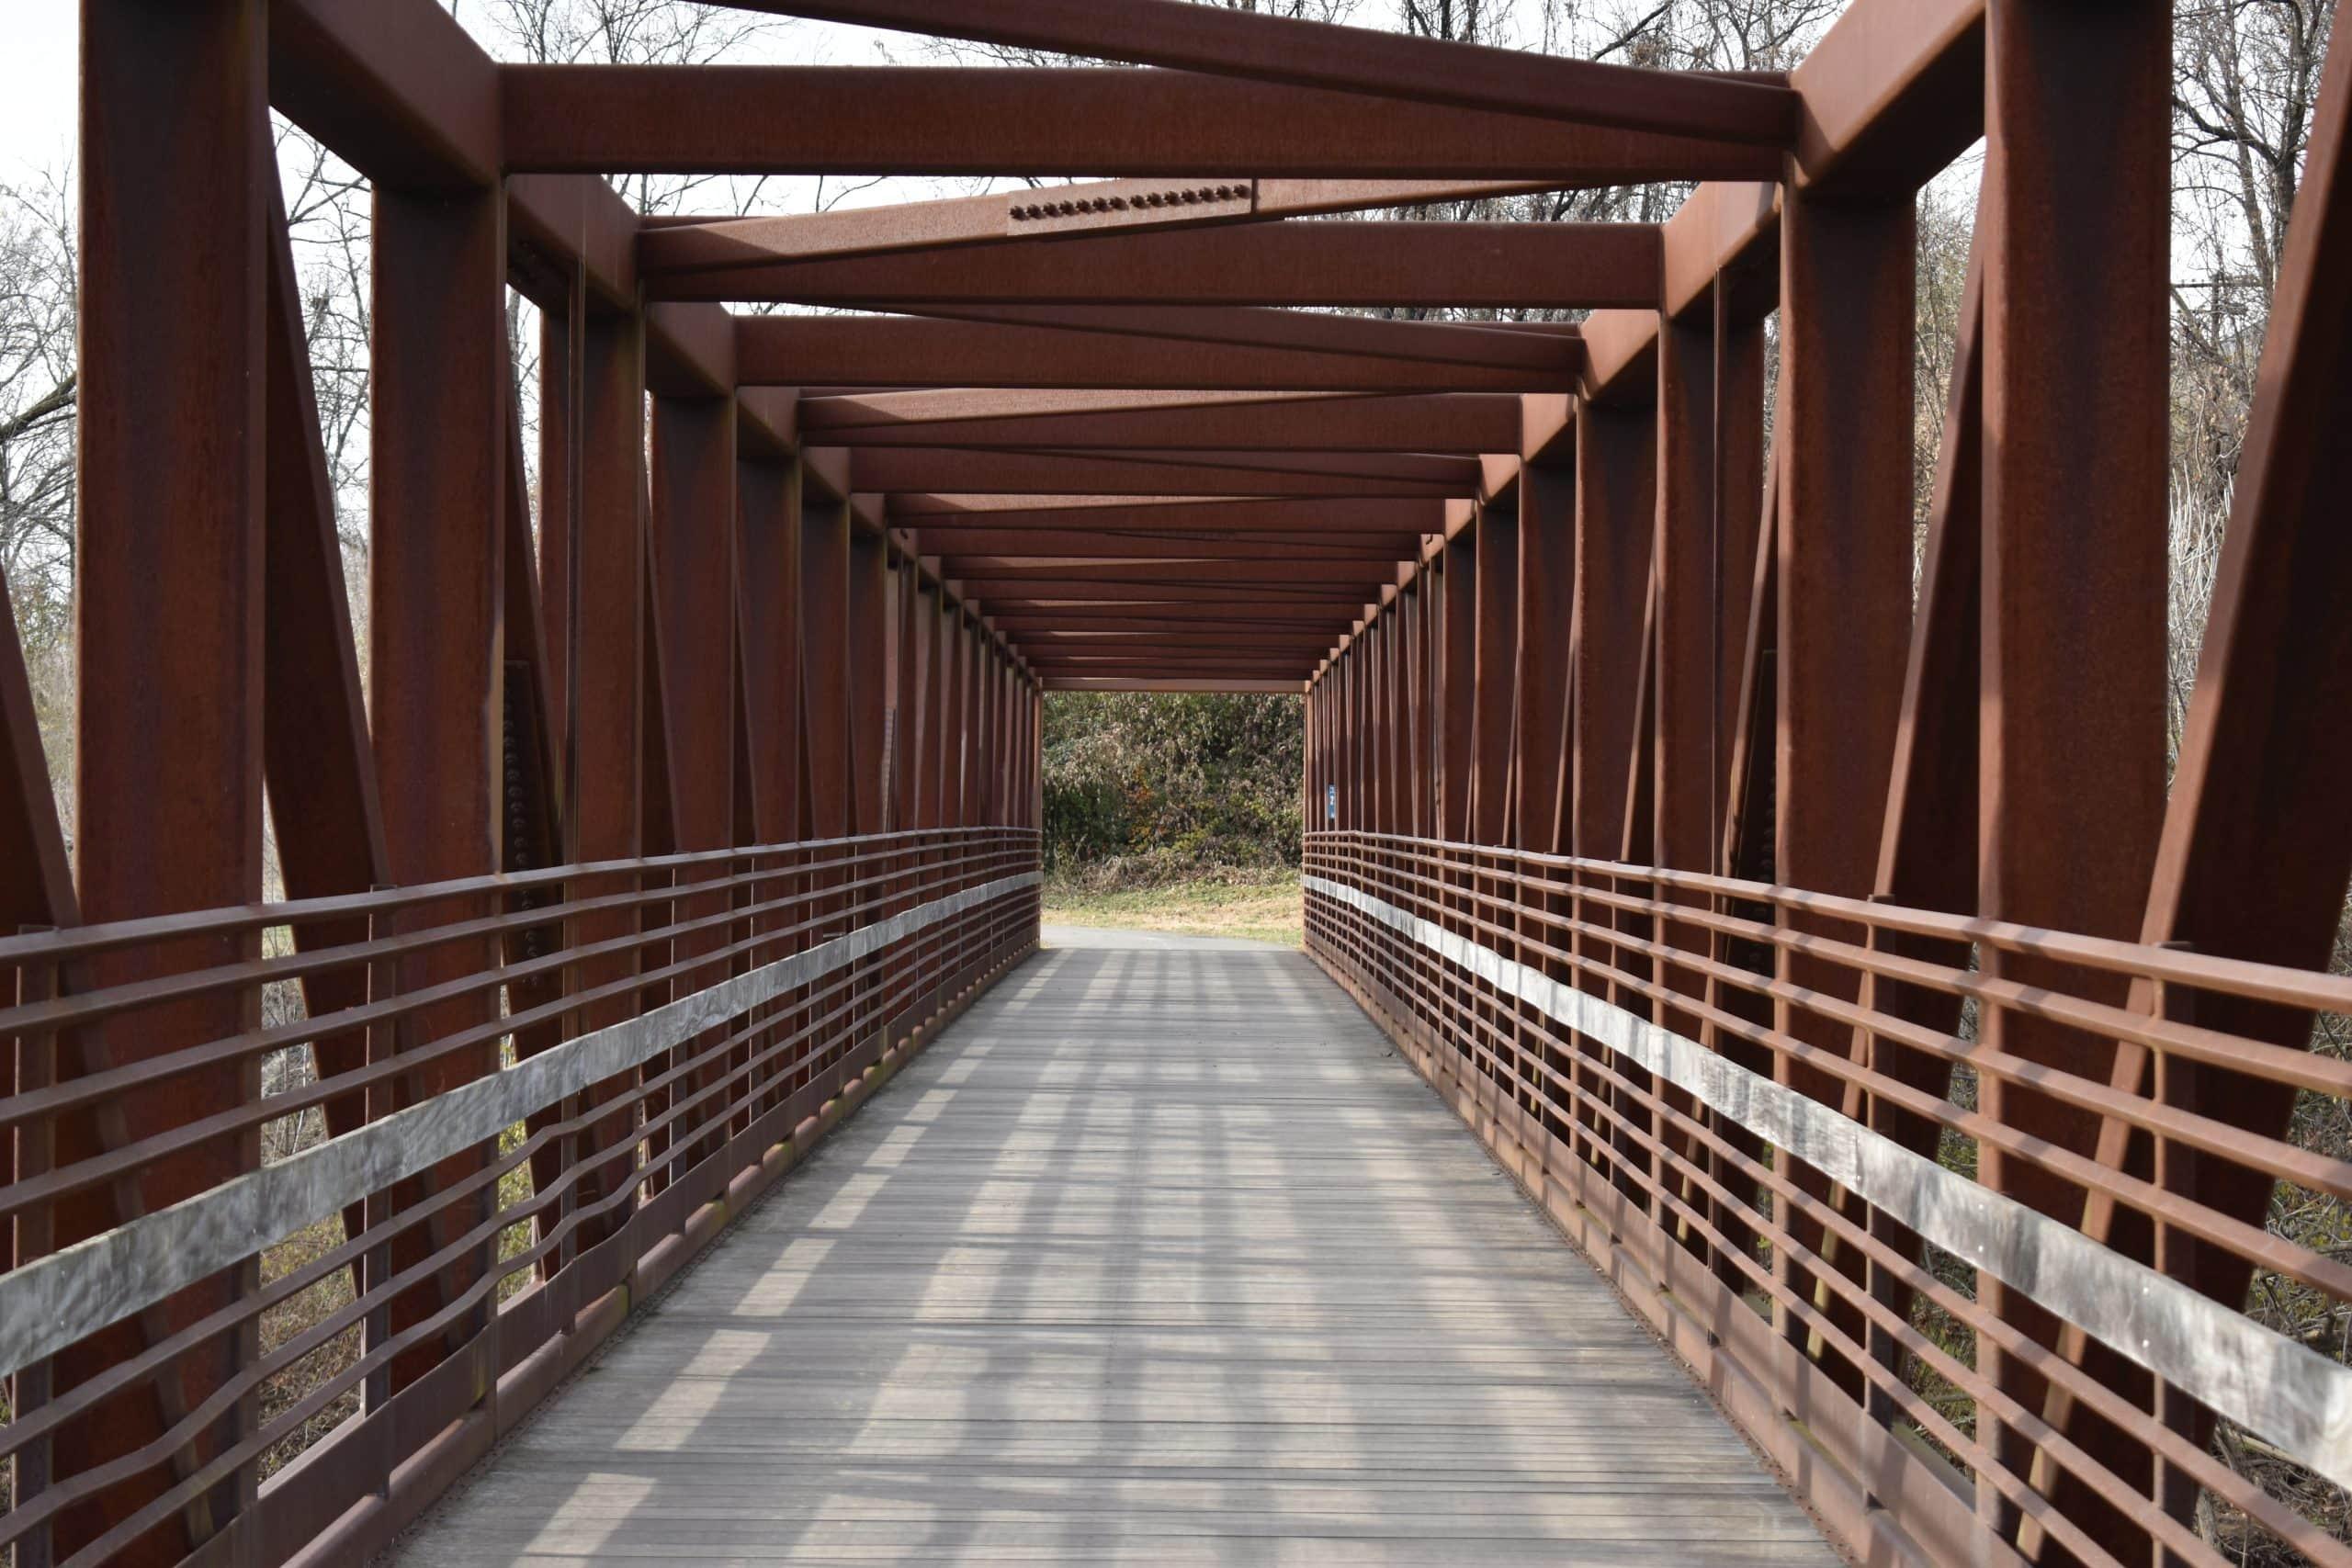 Yoanoke - Things to do in Roanoke, va